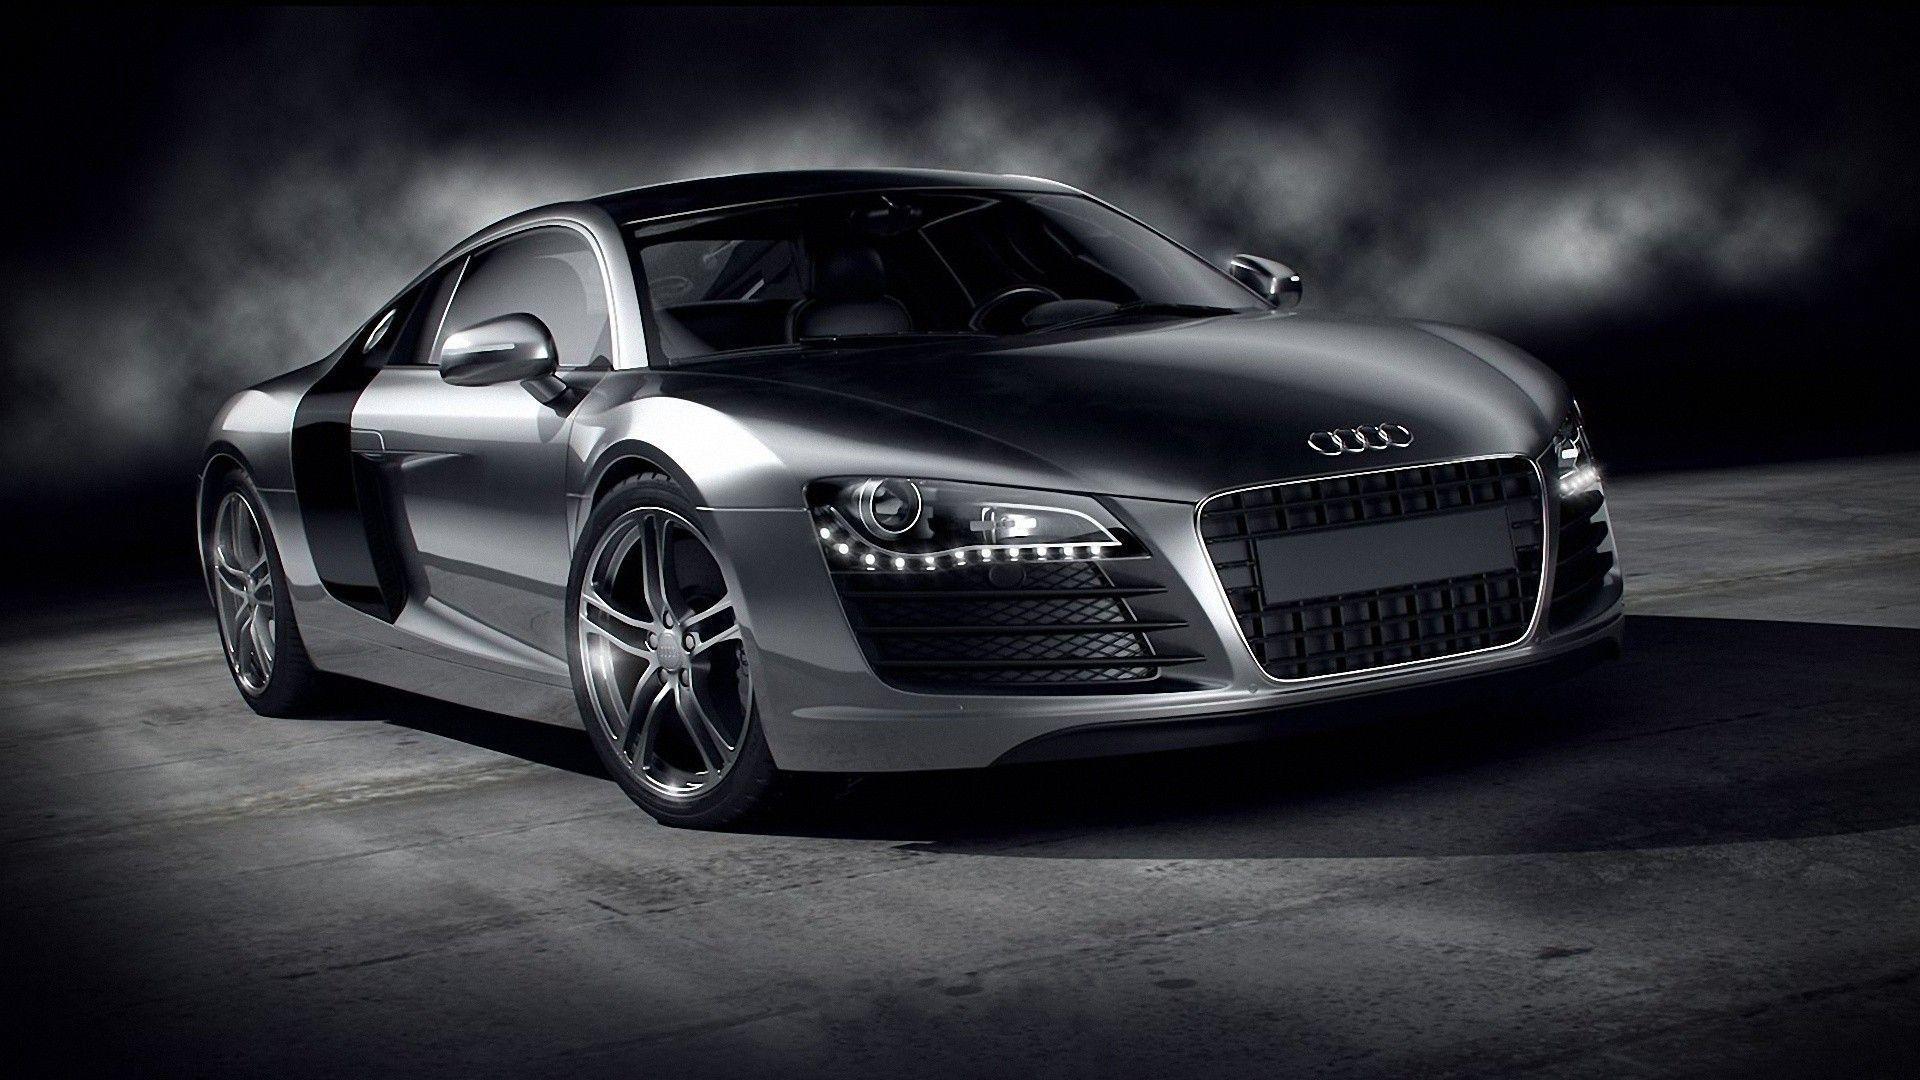 Audi R8 HD Wallpapers - Wallpaper Cave